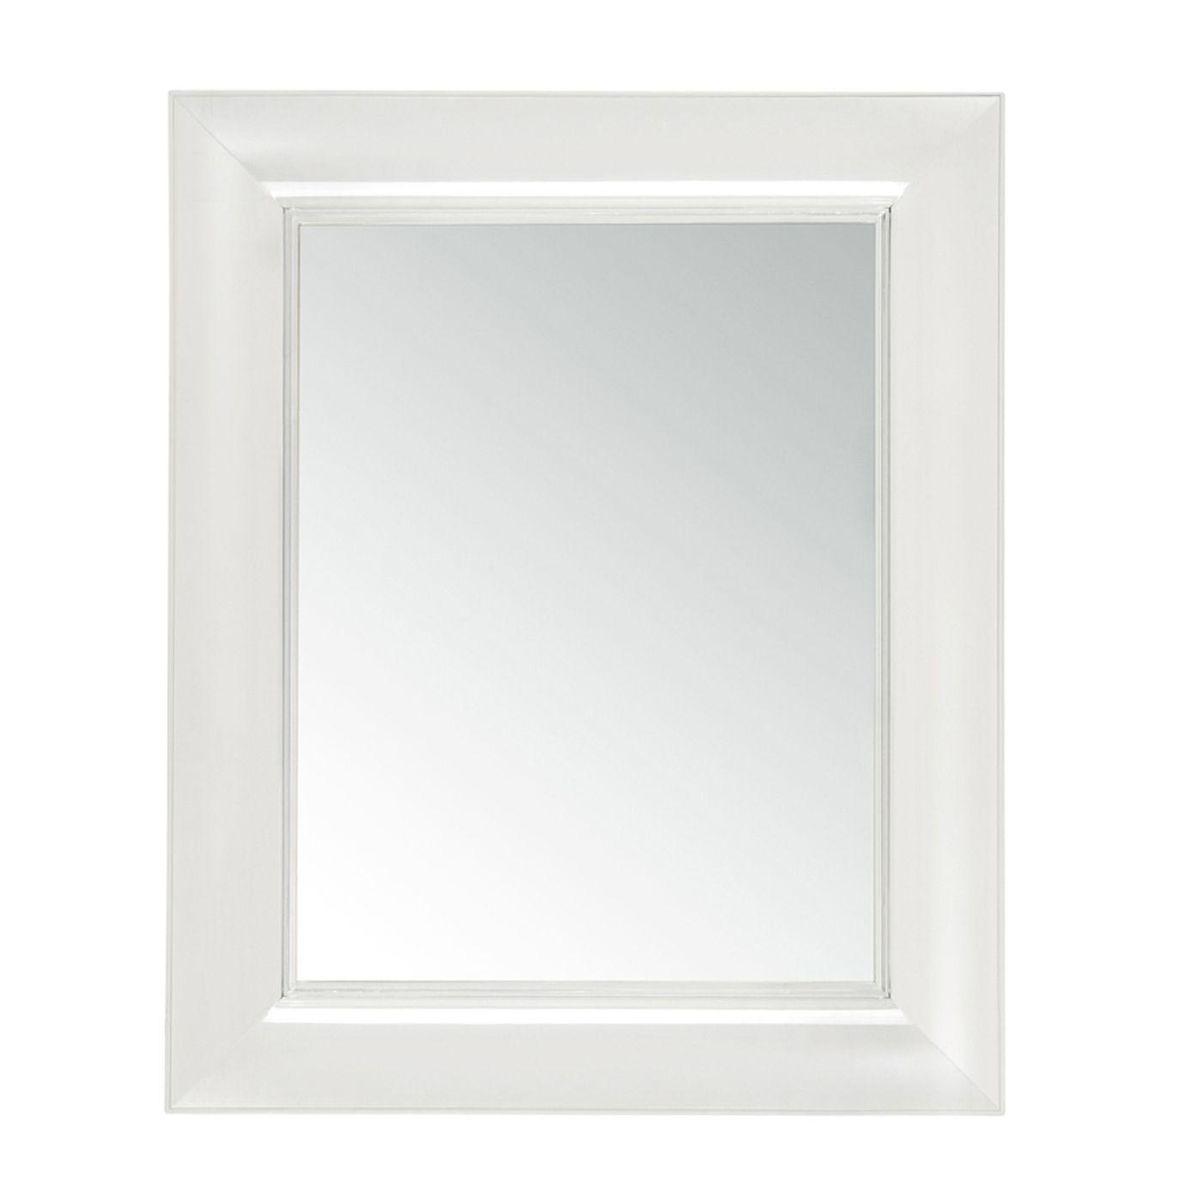 francois ghost mirror  kartell  ambientedirectcom - kartell  francois ghost mirror  crystal cleartransparent x  x